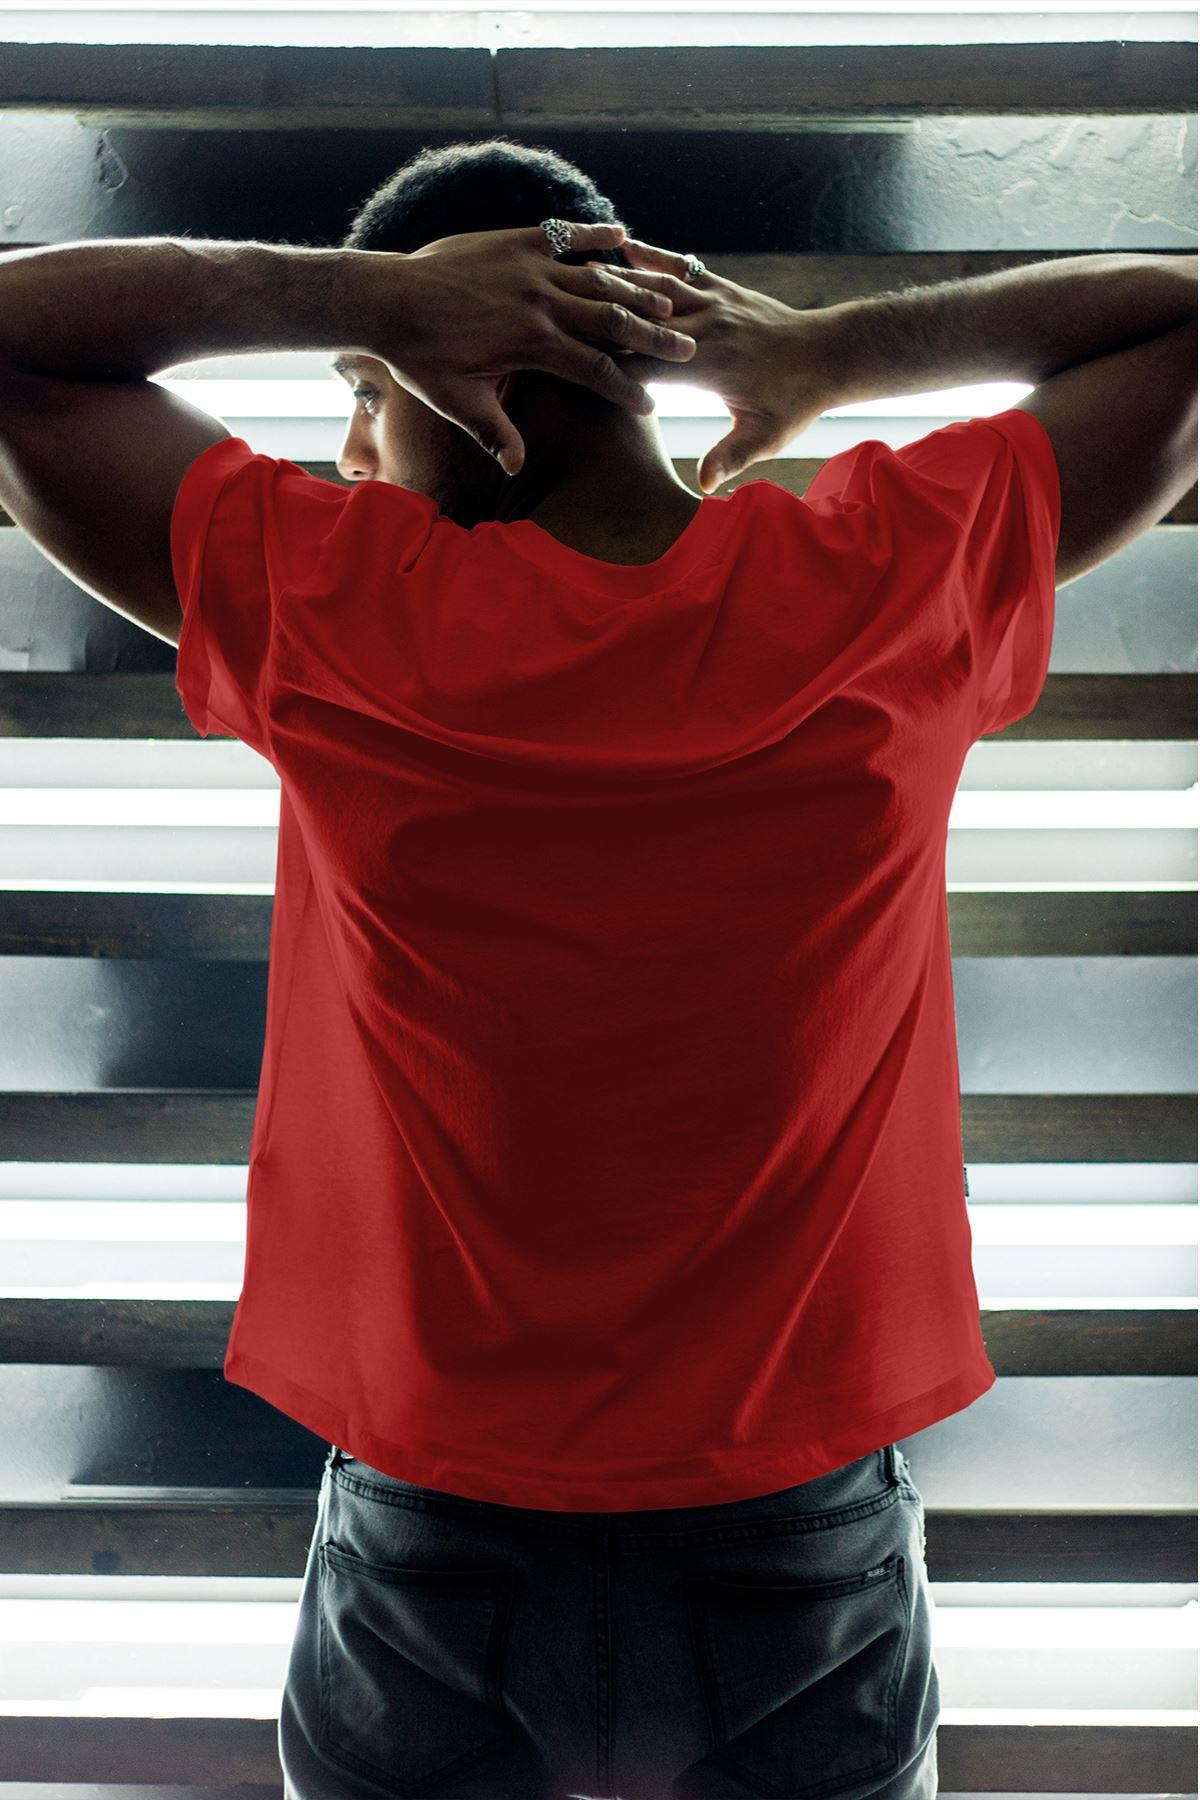 Chicago Bulls 36 Kırmızı Erkek Oversize Tshirt - Tişört